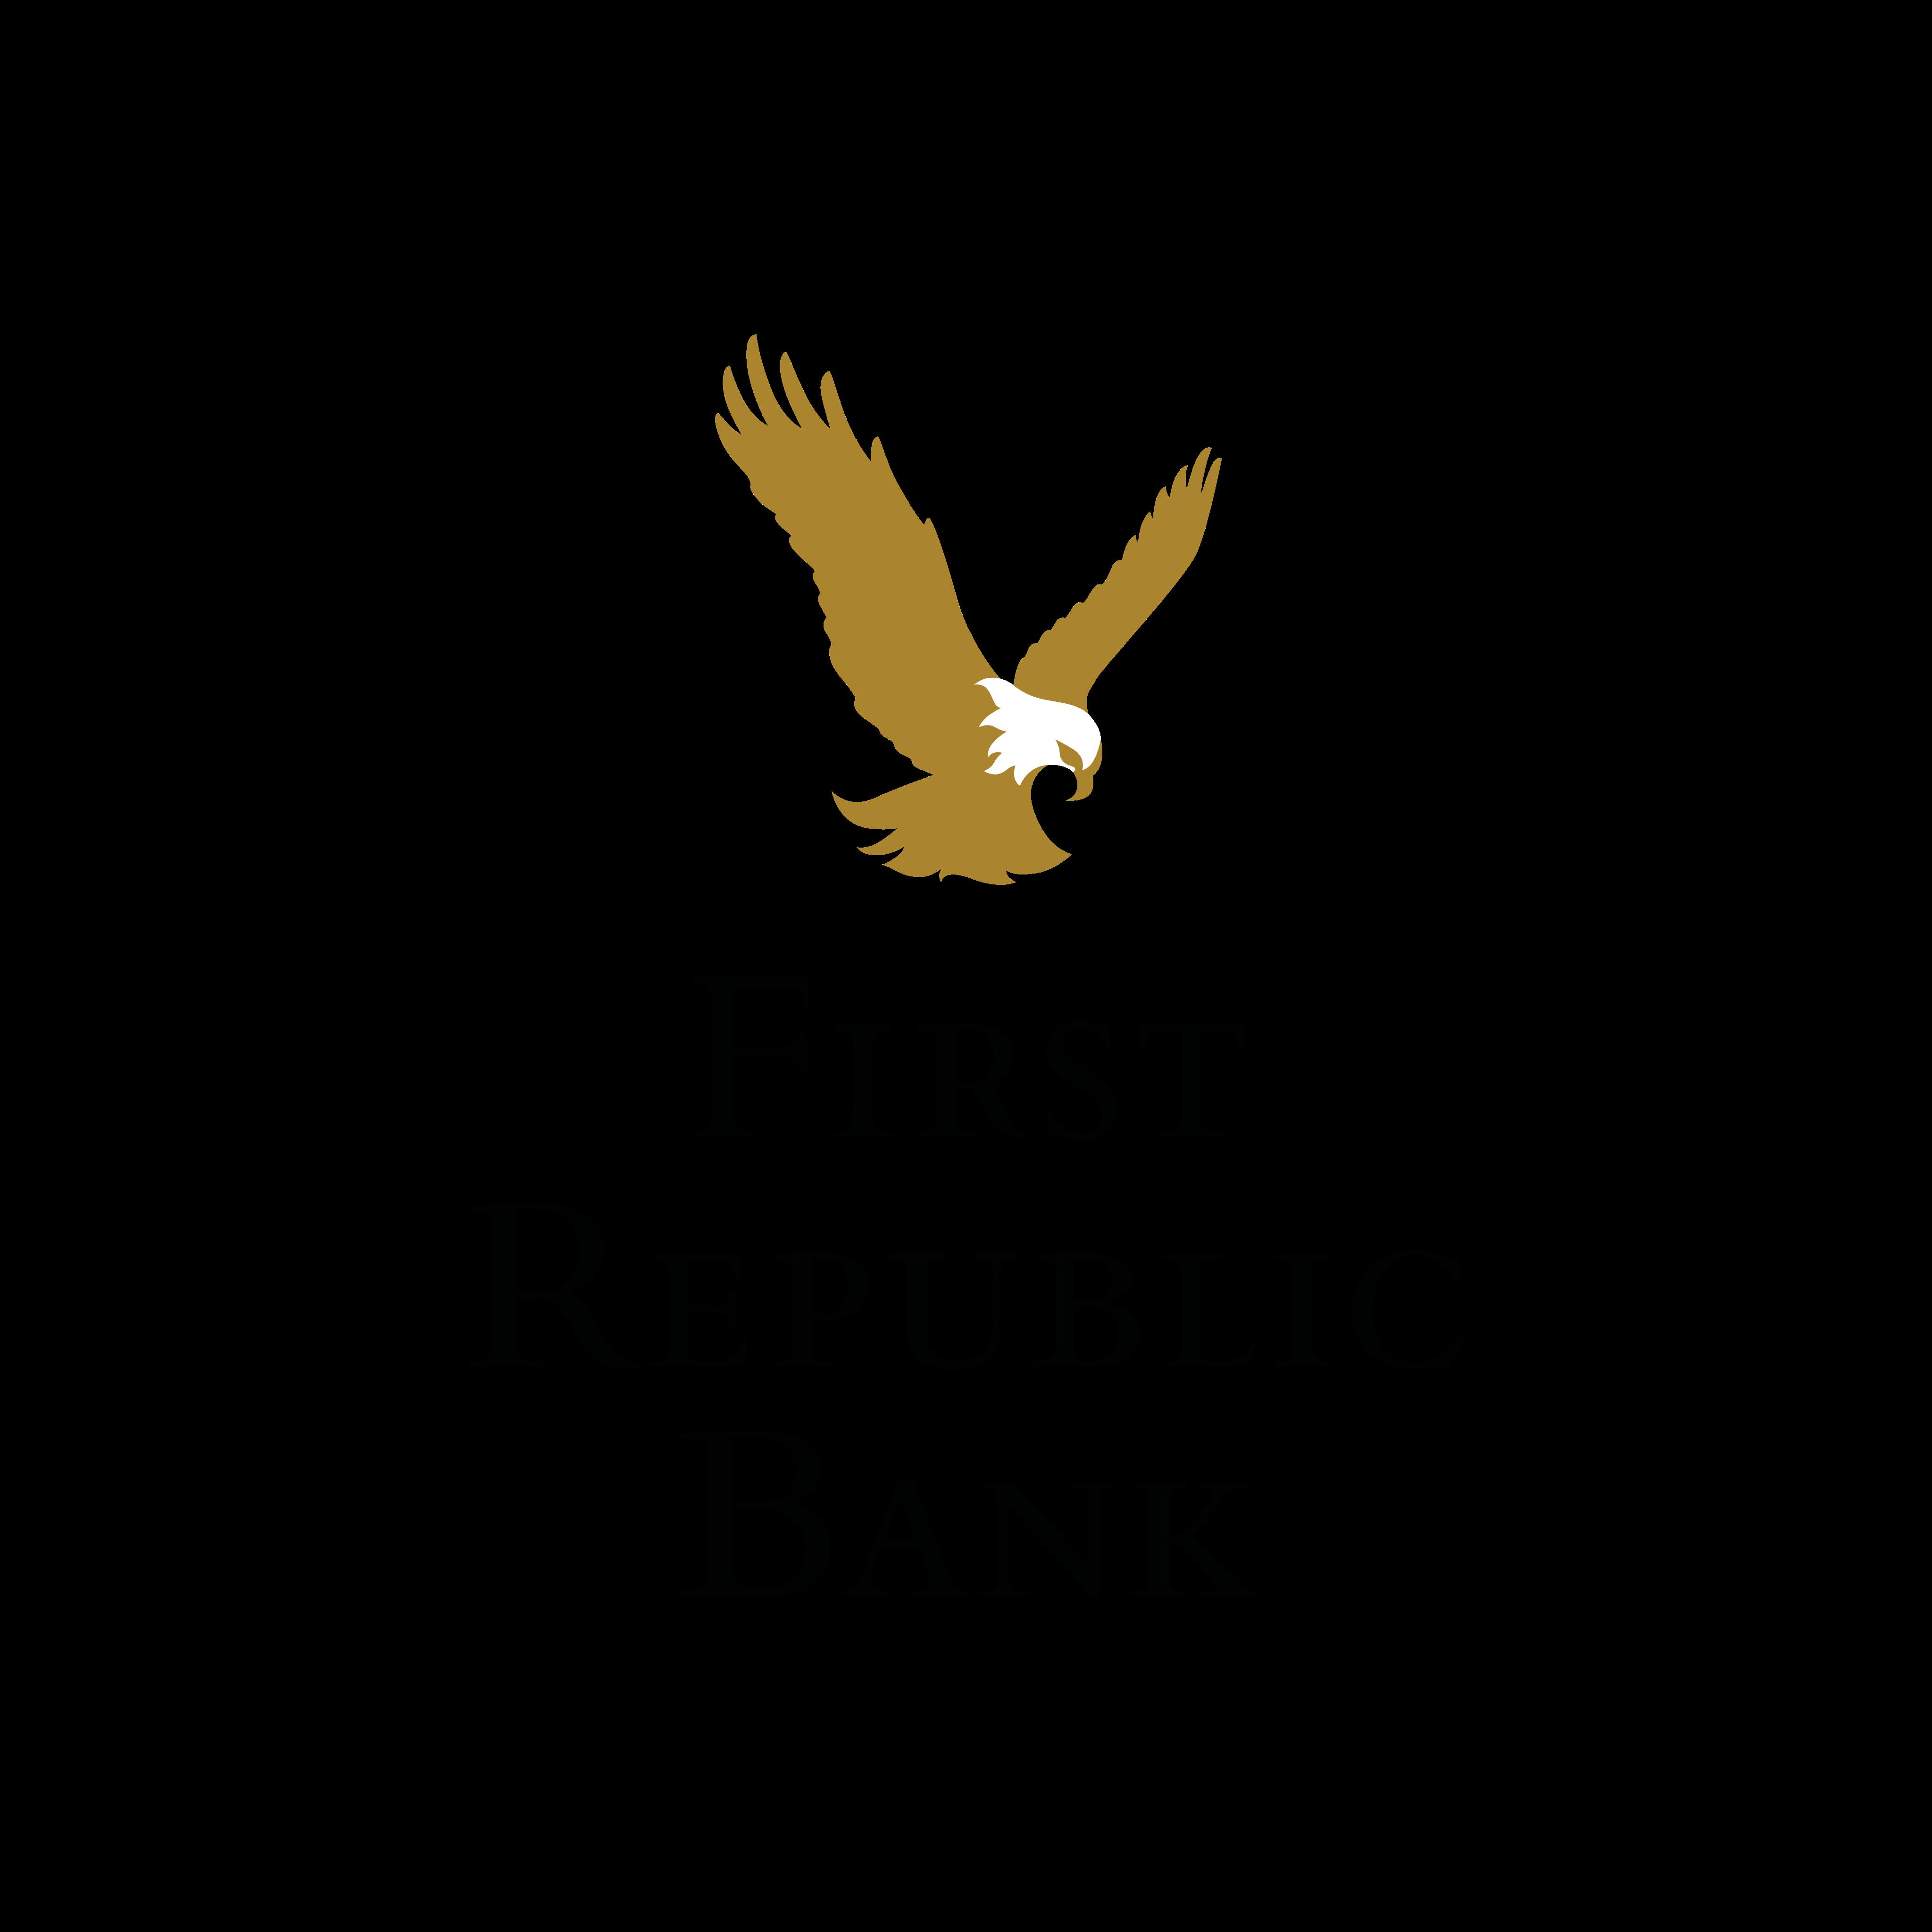 first republic bank logo 0 - First Republic Bank Logo